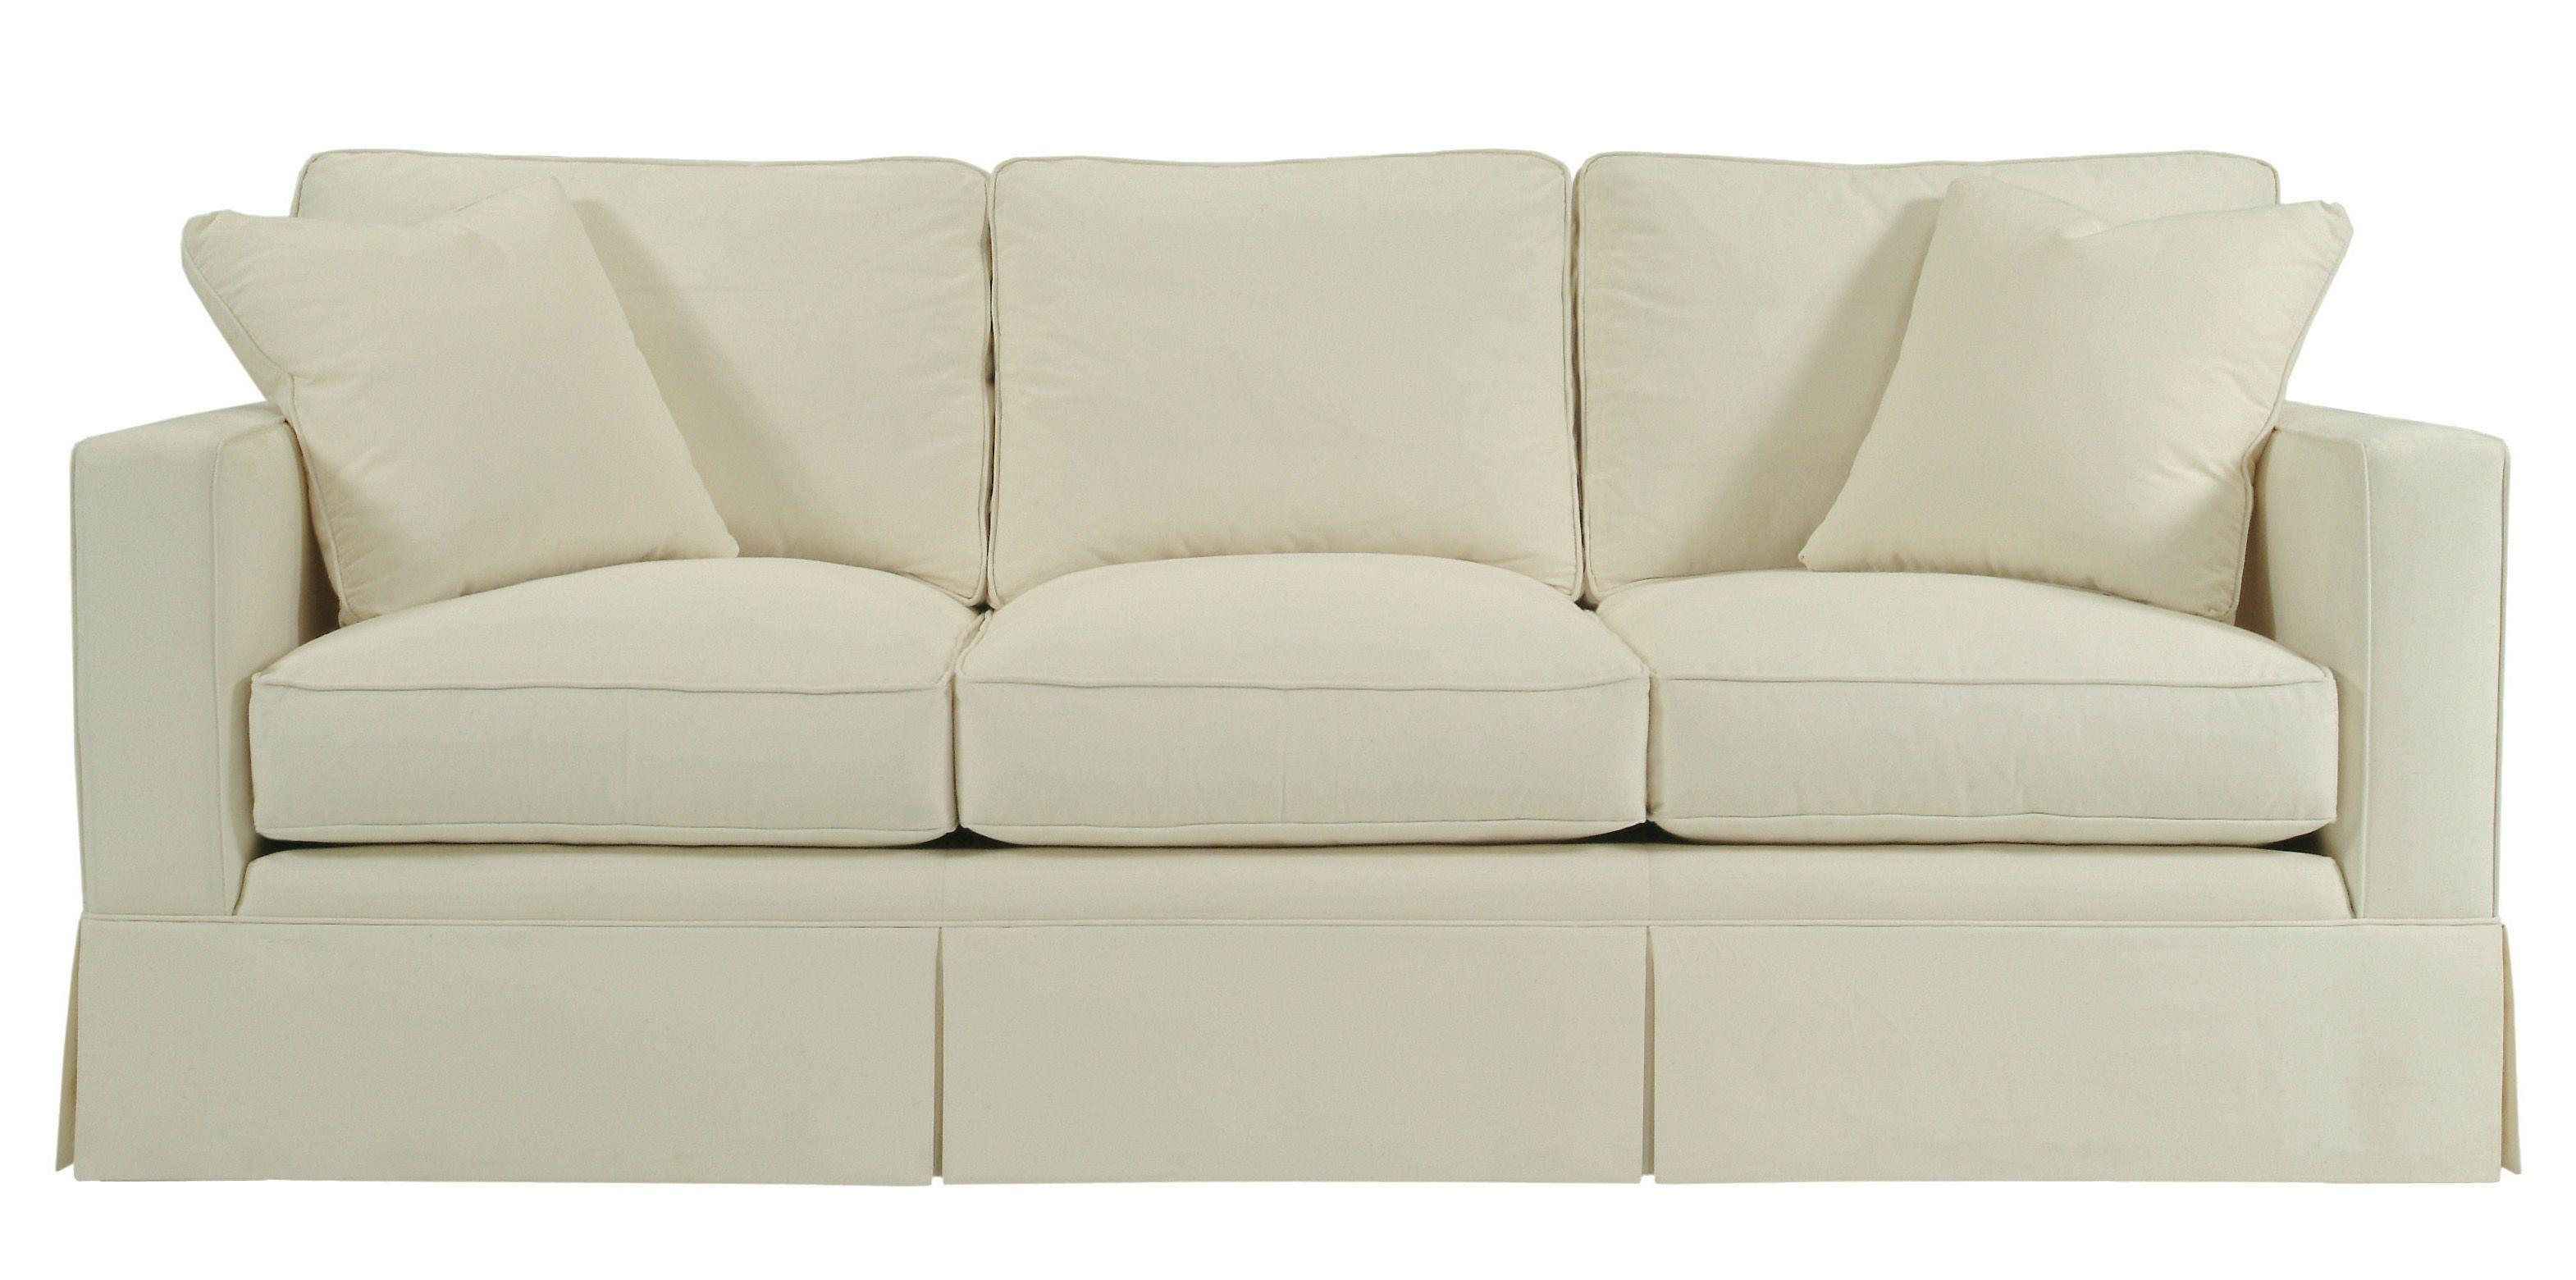 Vanguard Living Room Hillcrest Sofa 600 S Vanguard Furniture